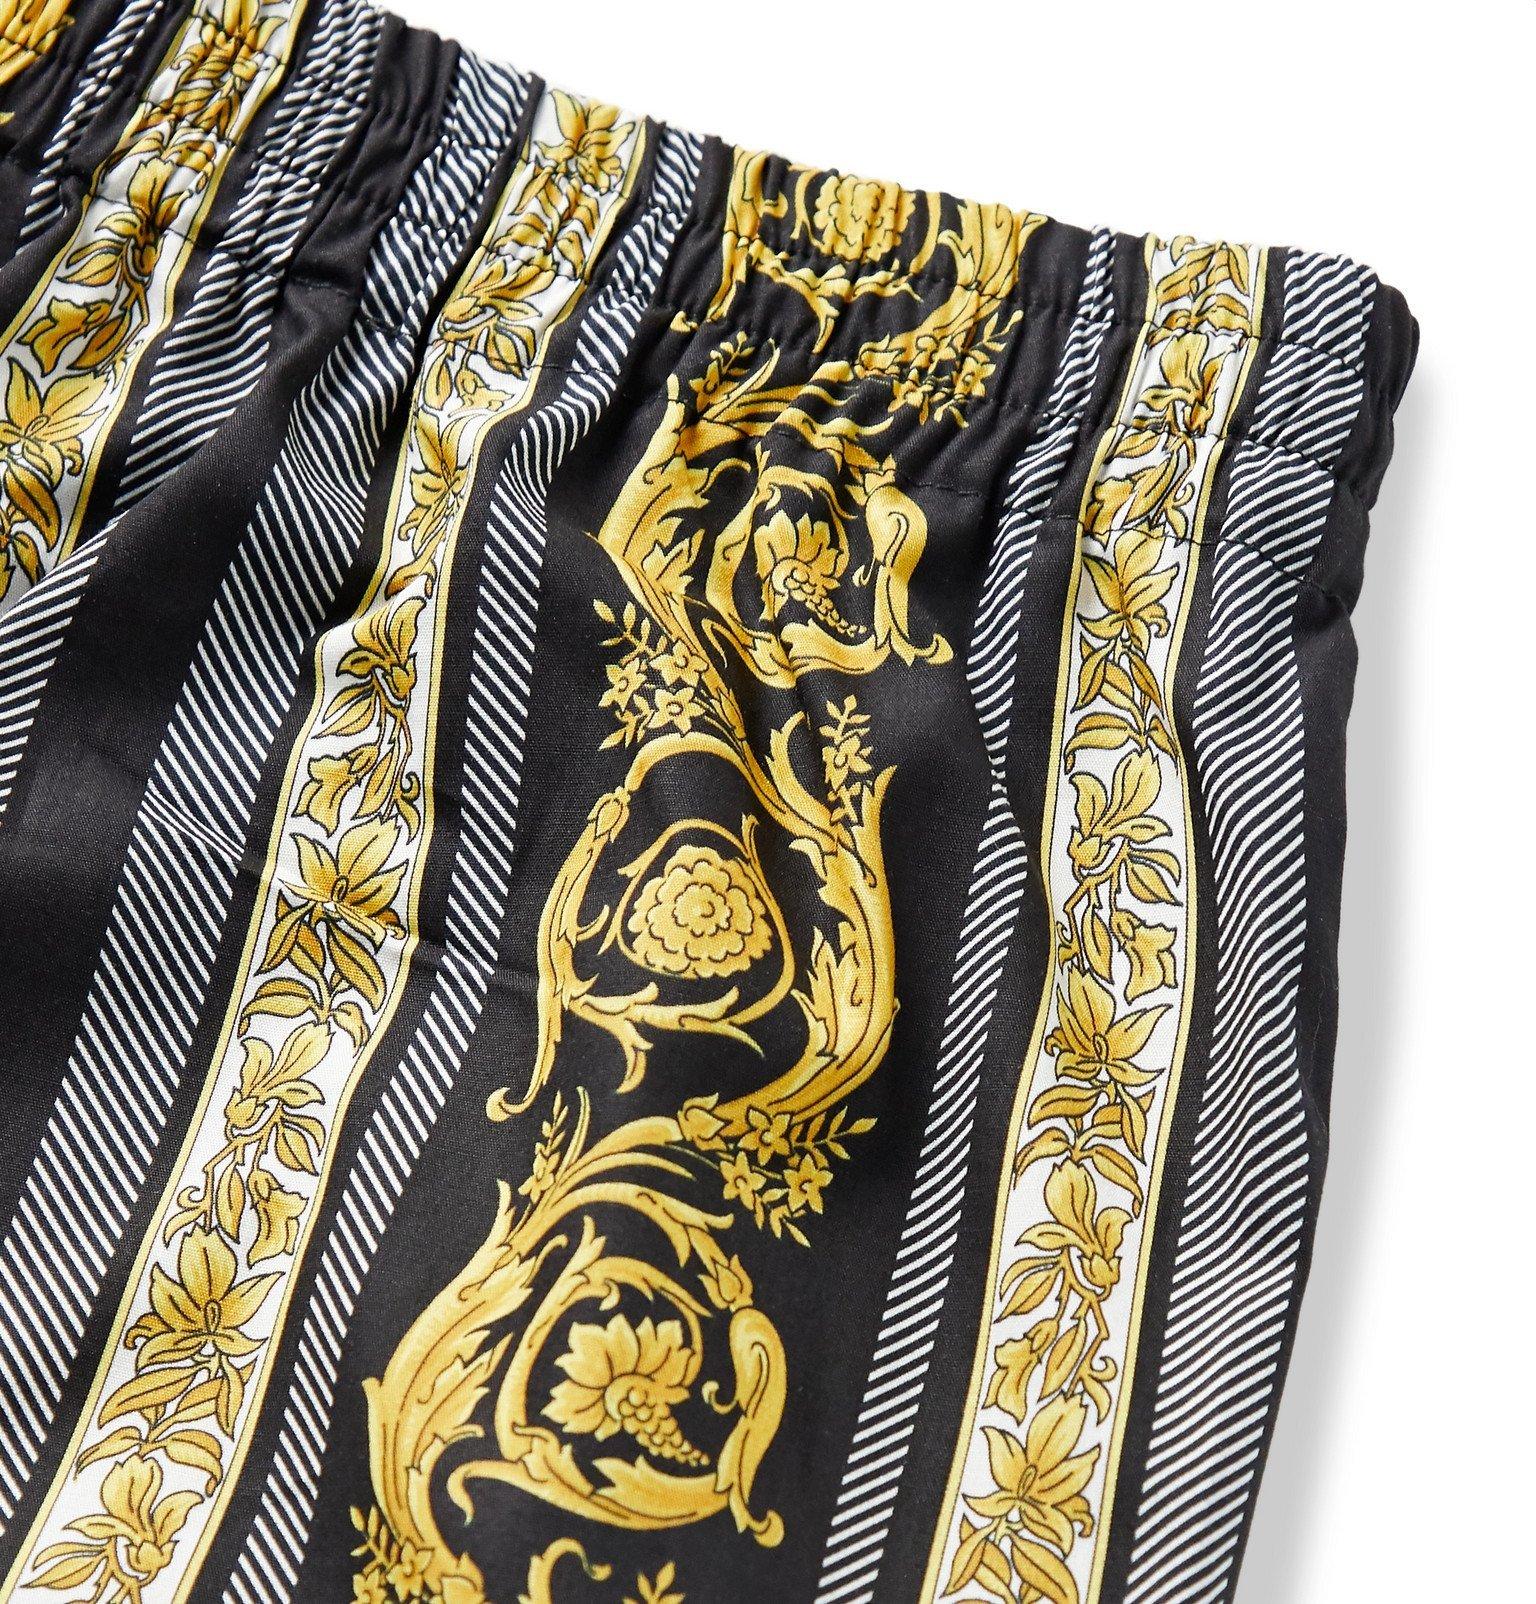 Versace - Printed Cotton Boxer Shorts - Black